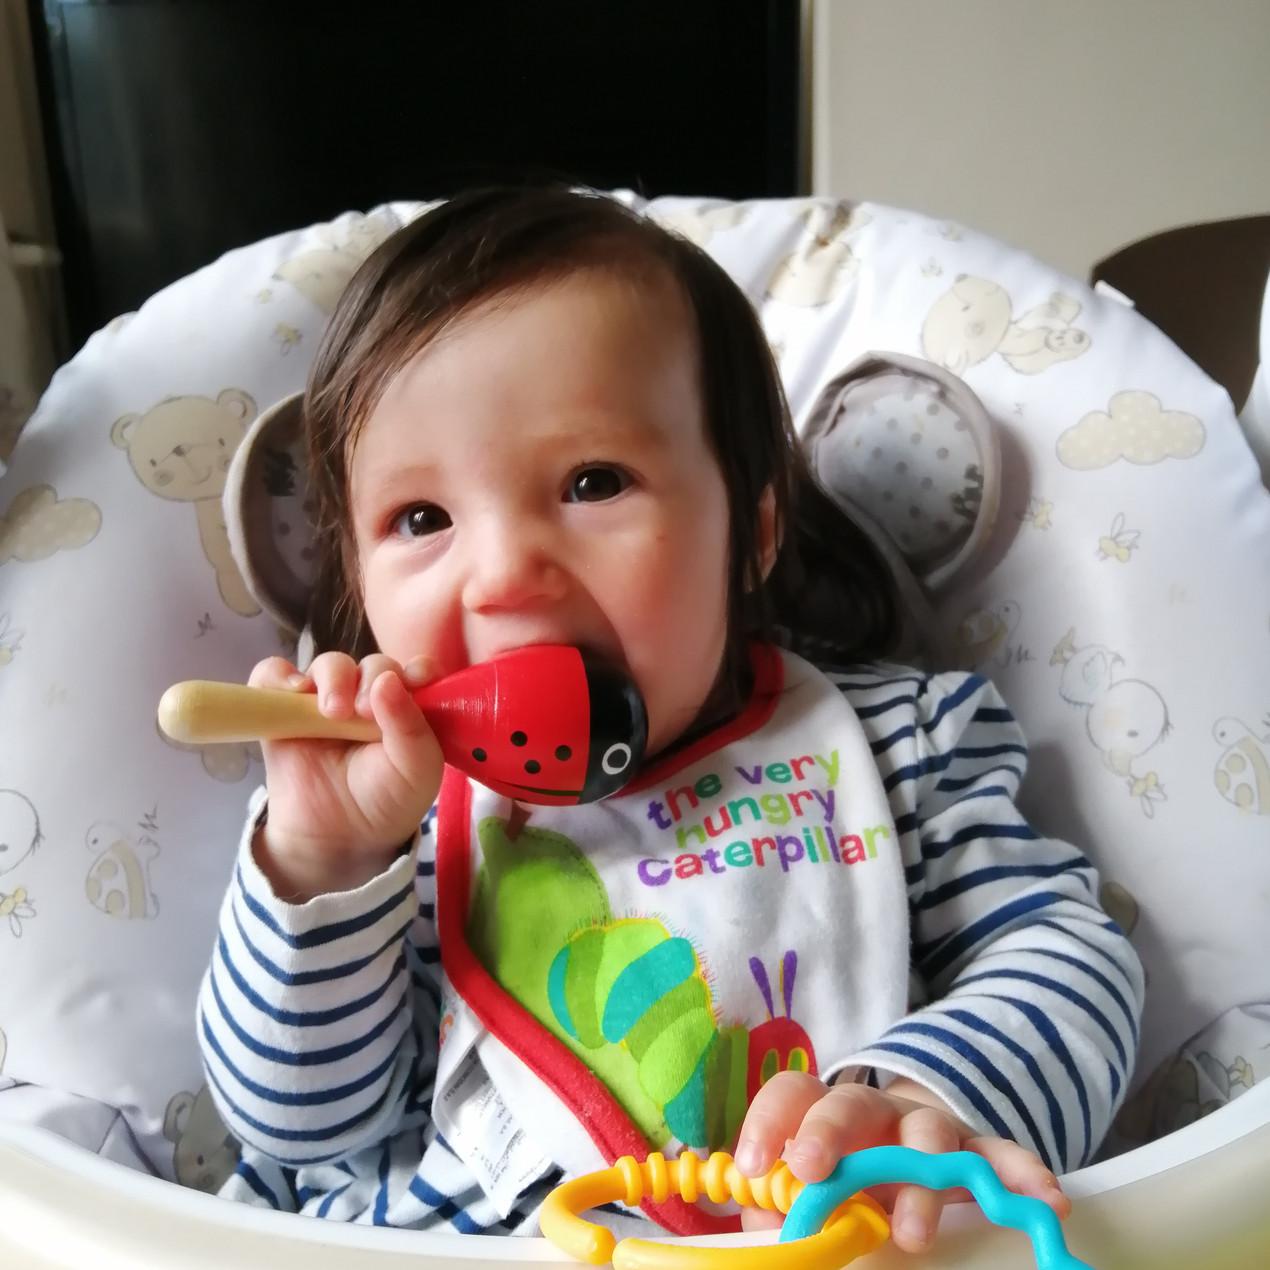 Matilda enjoying a nibble of her rattle